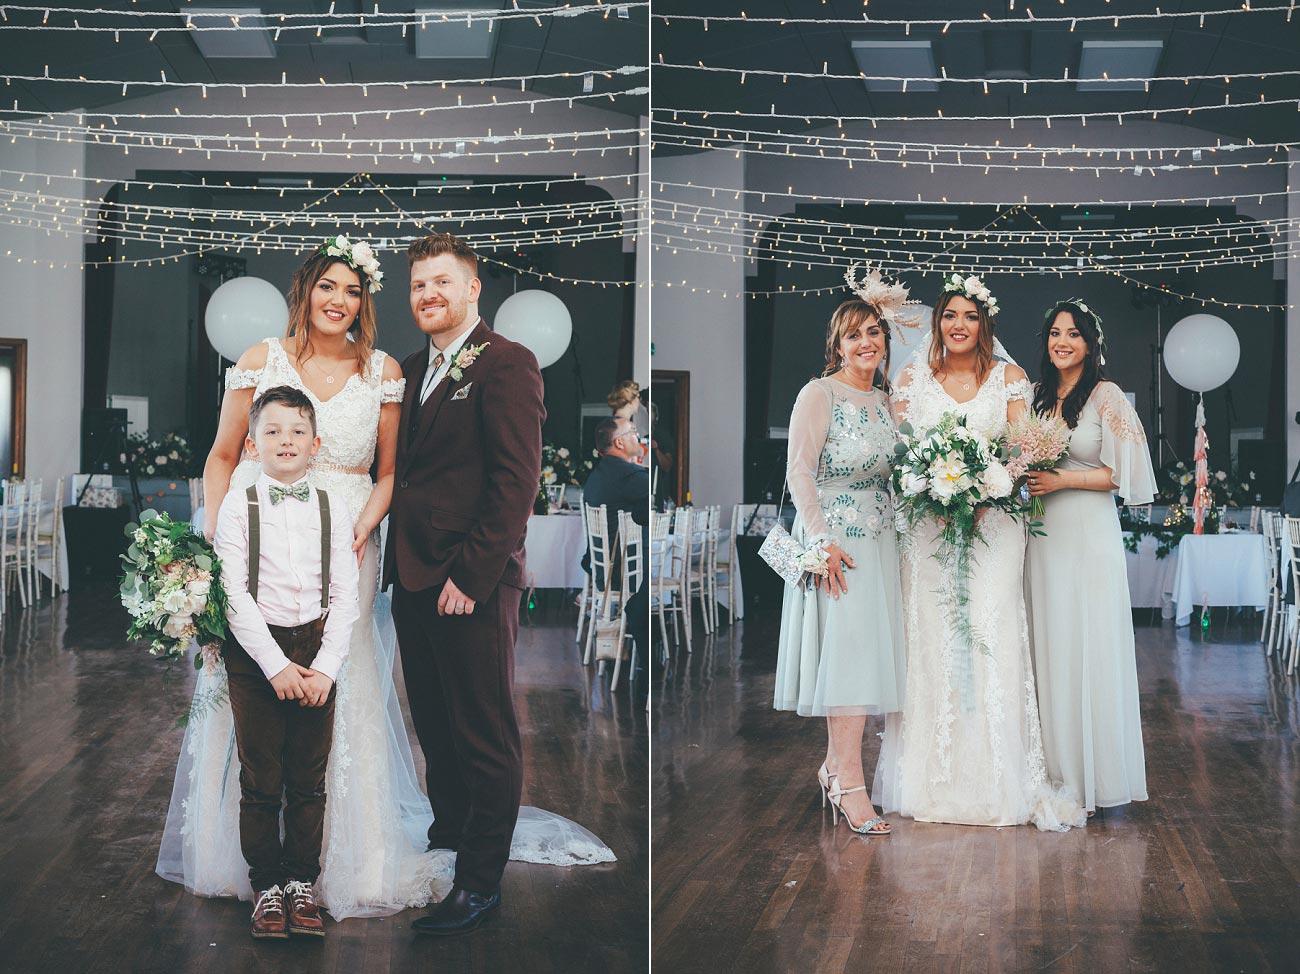 wedding photography fife letham village Hall scotland woodland vintage 0089